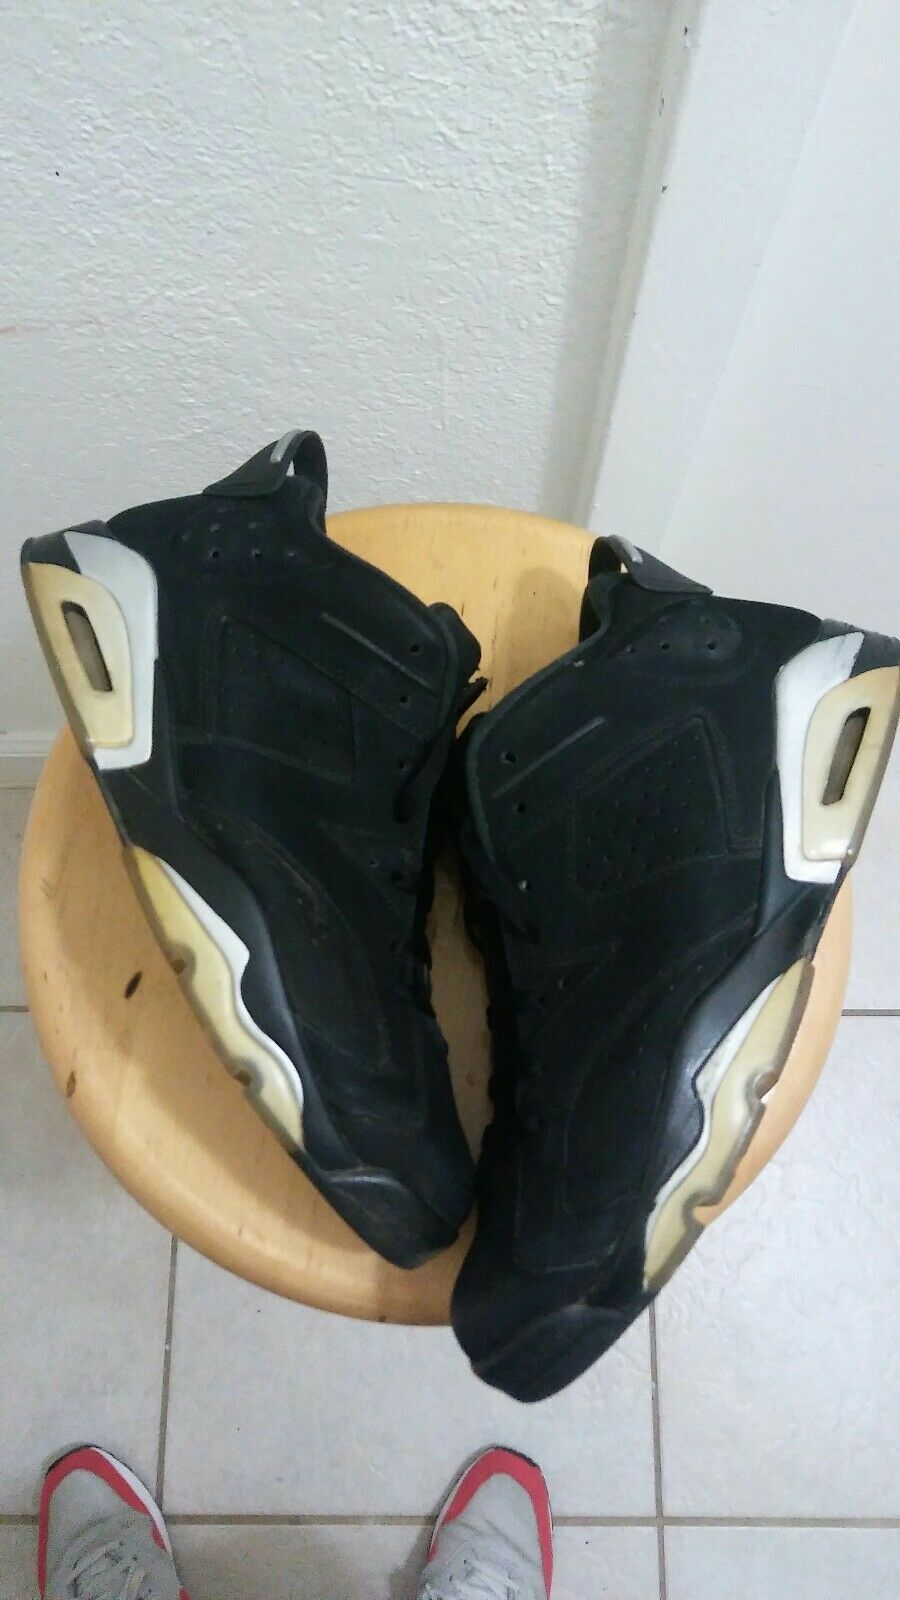 Air Jordan Retro 6 Low Chrome Size 11